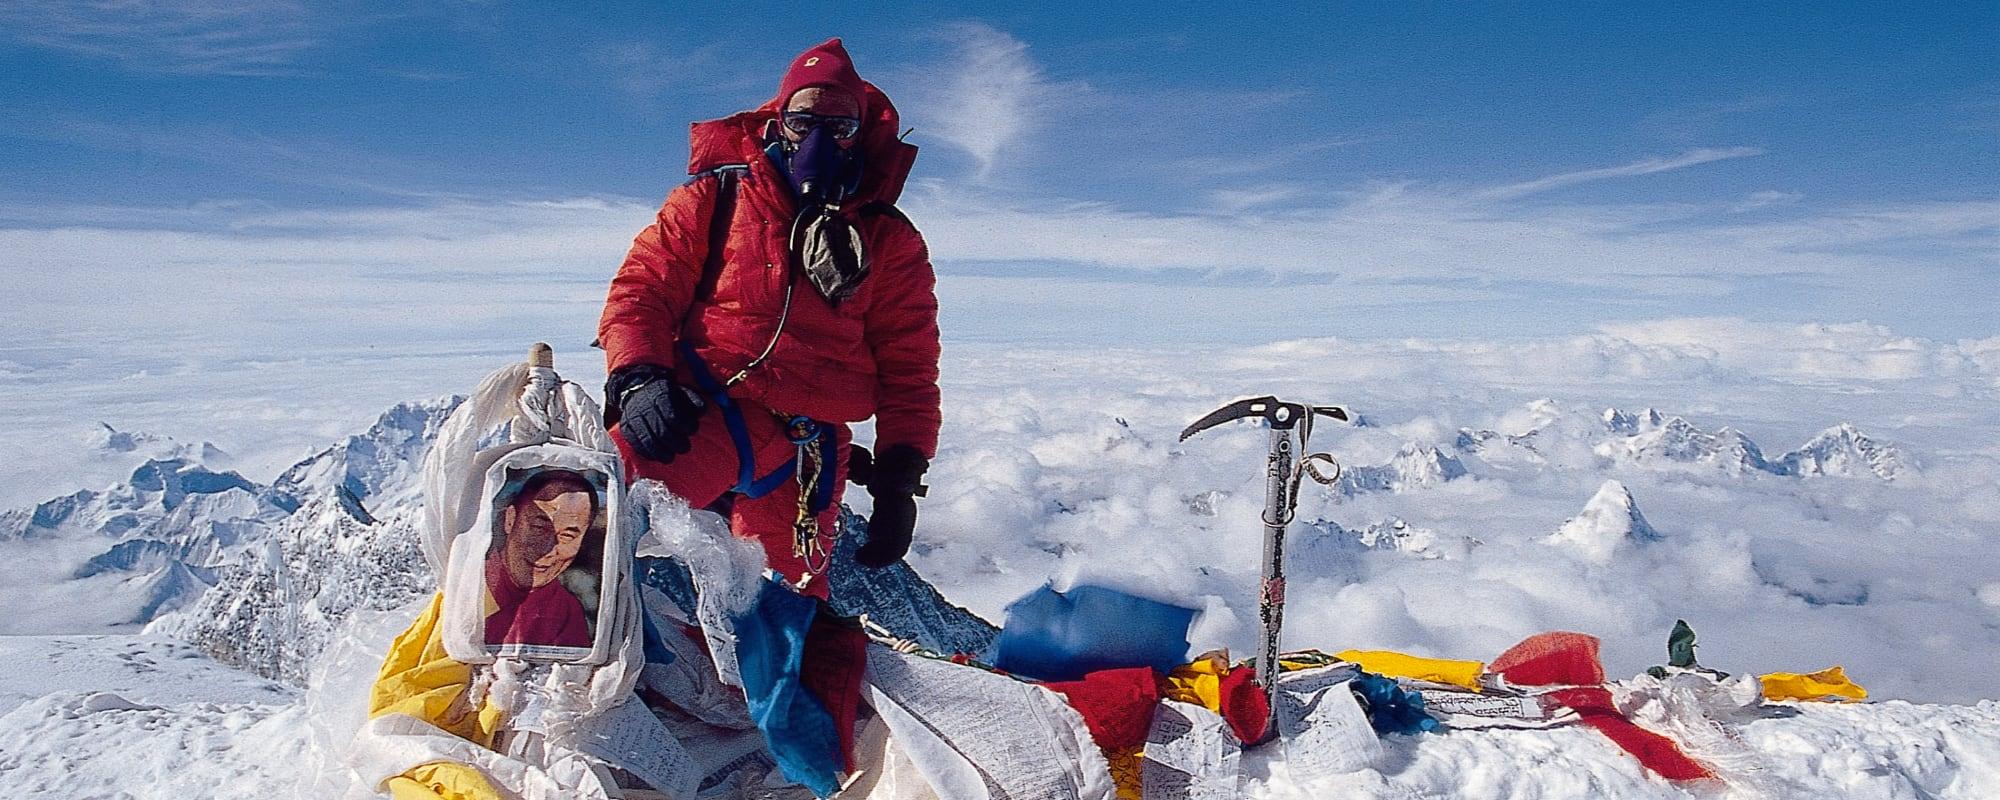 Jangbu on Everest summit